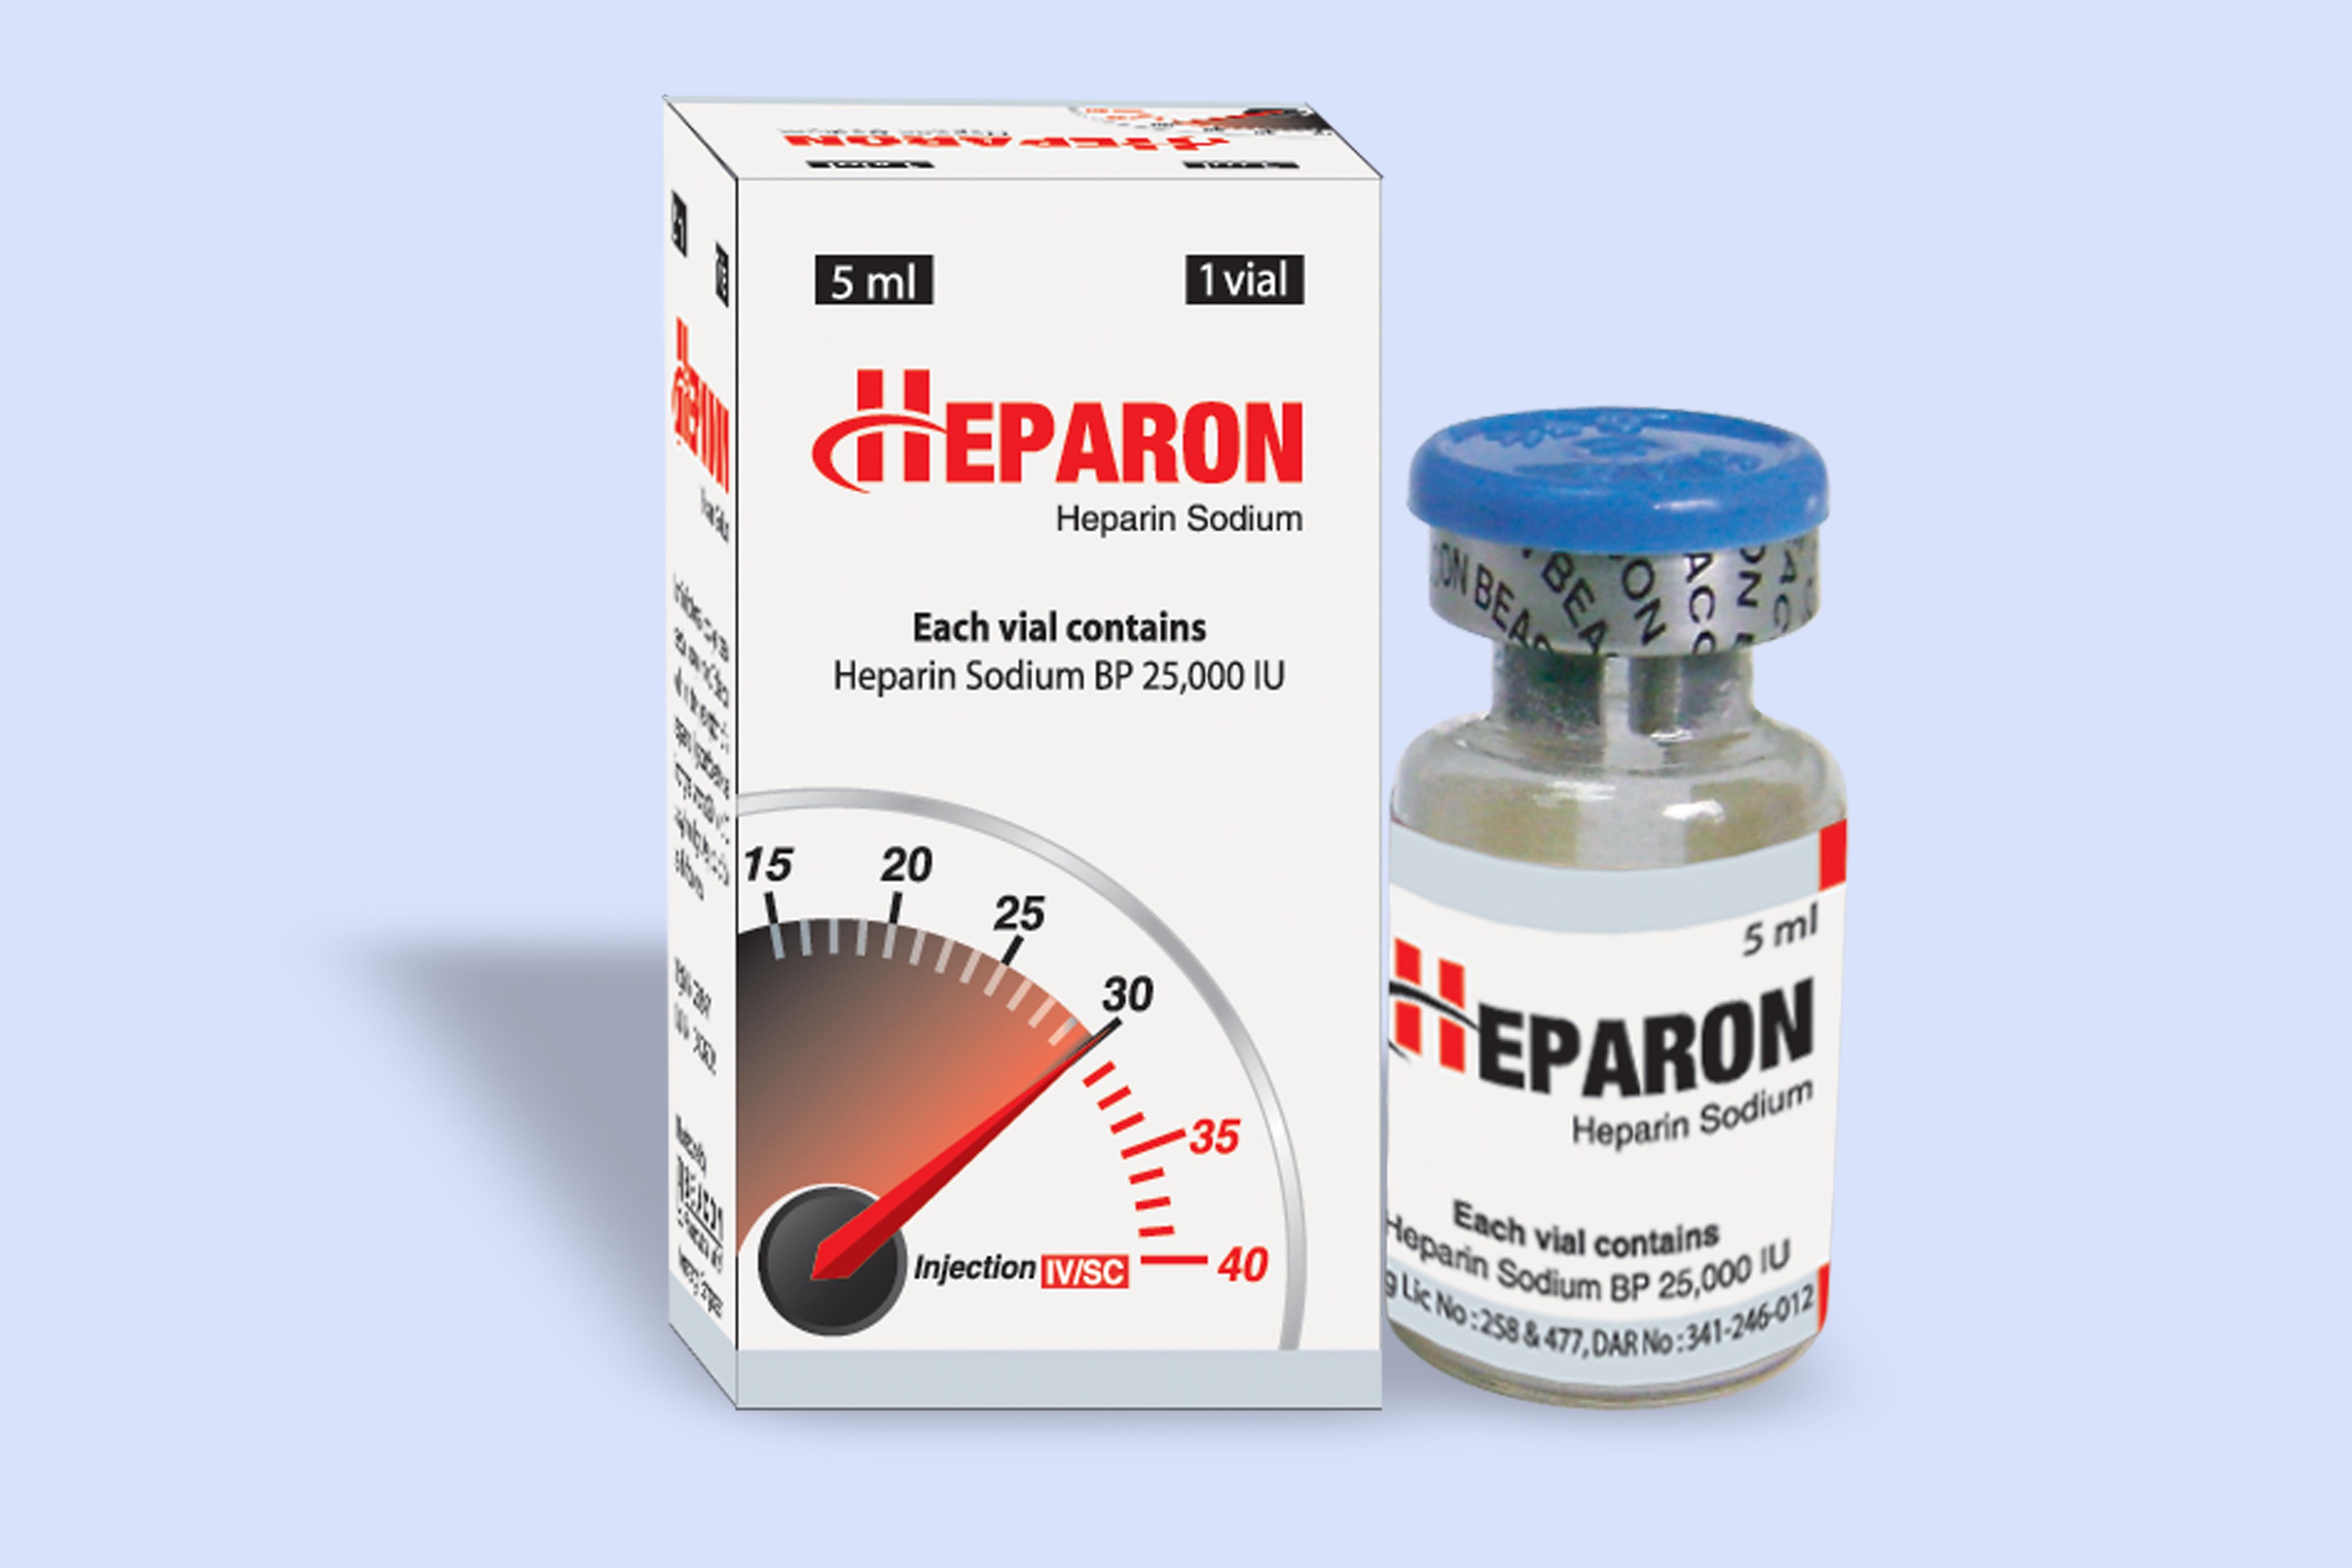 Heparon